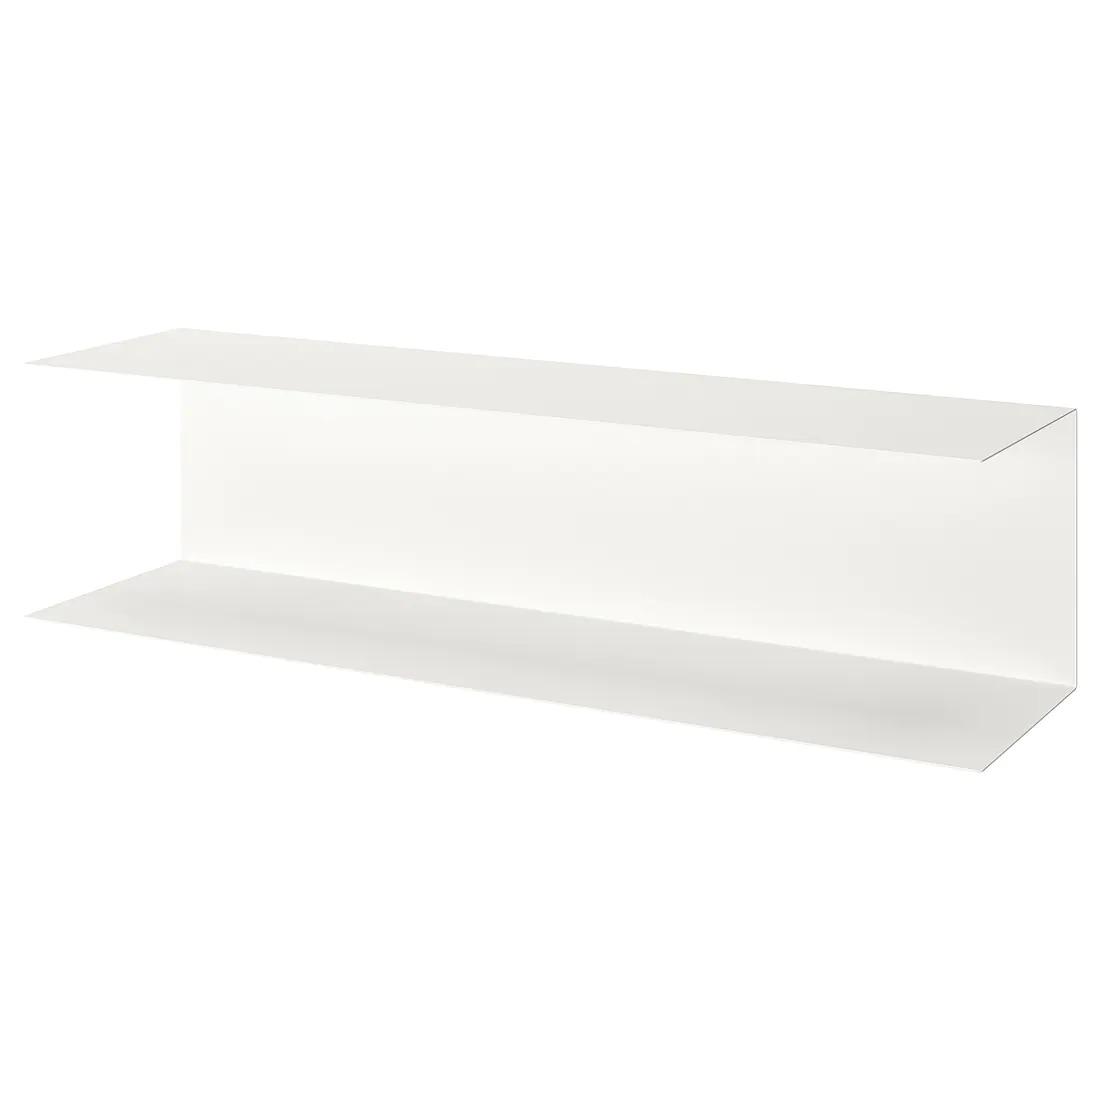 BOTKYRKA Estante, blanco, 80x20 cm 29€